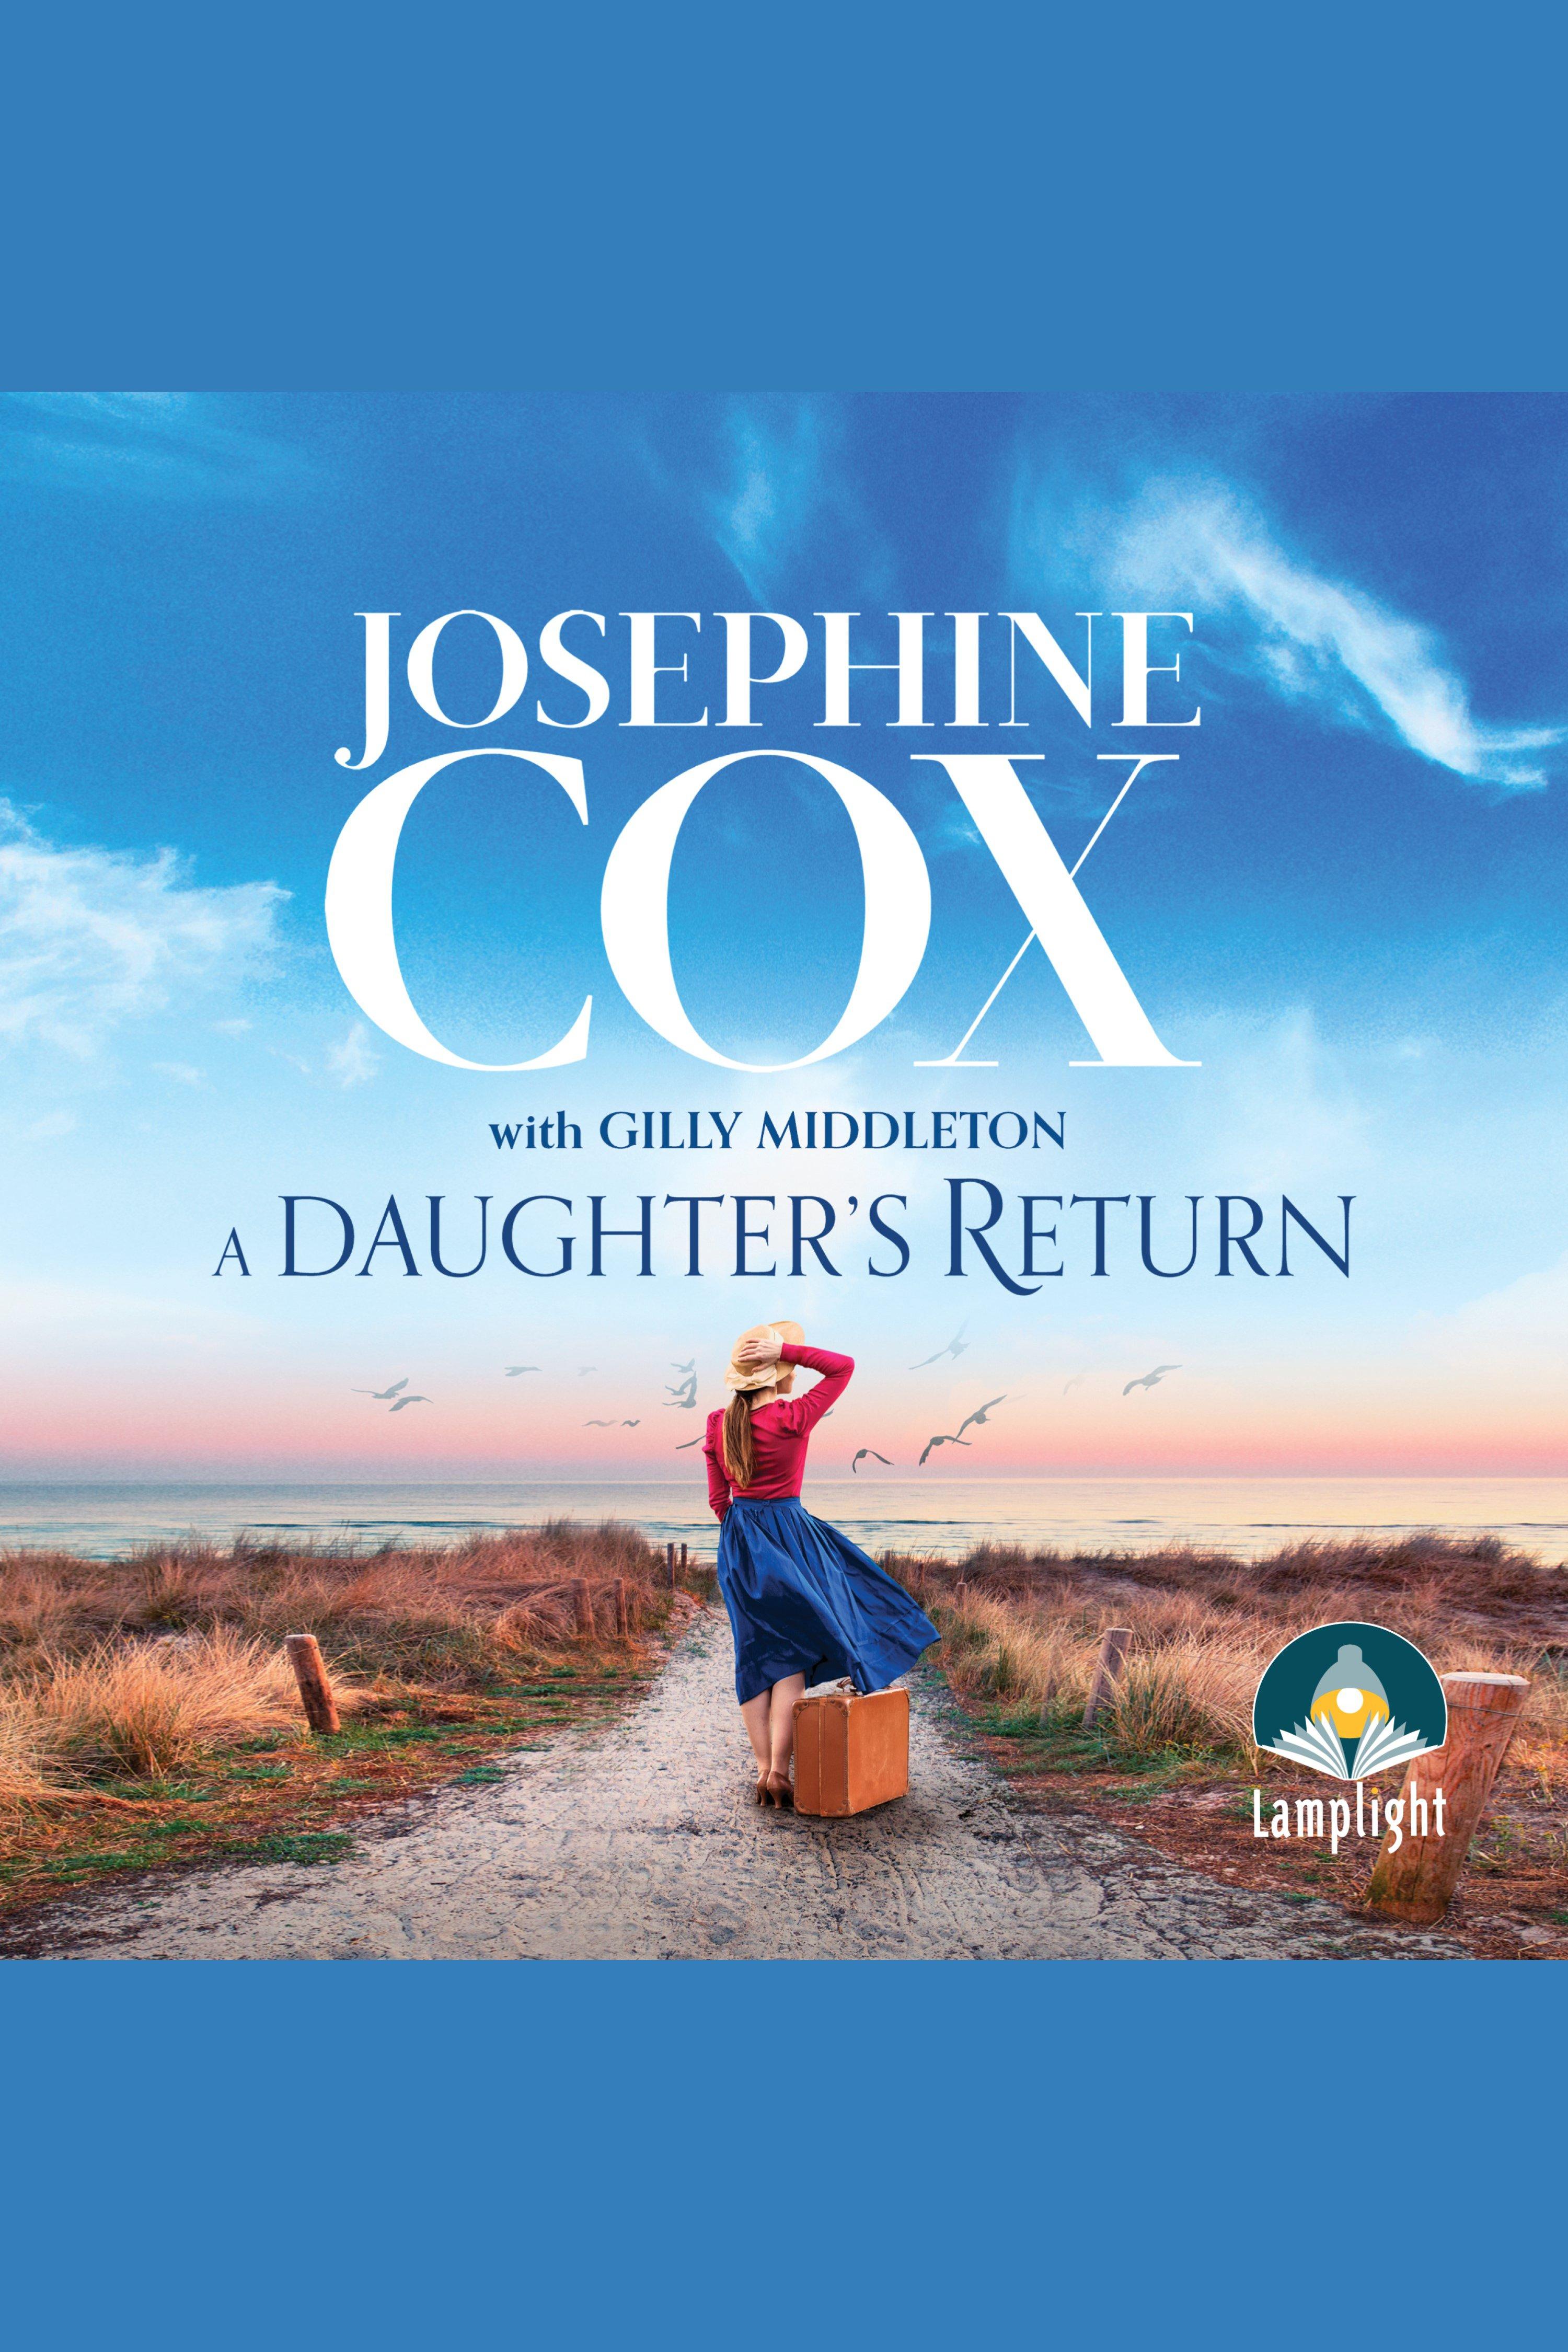 Daughter's Return, A